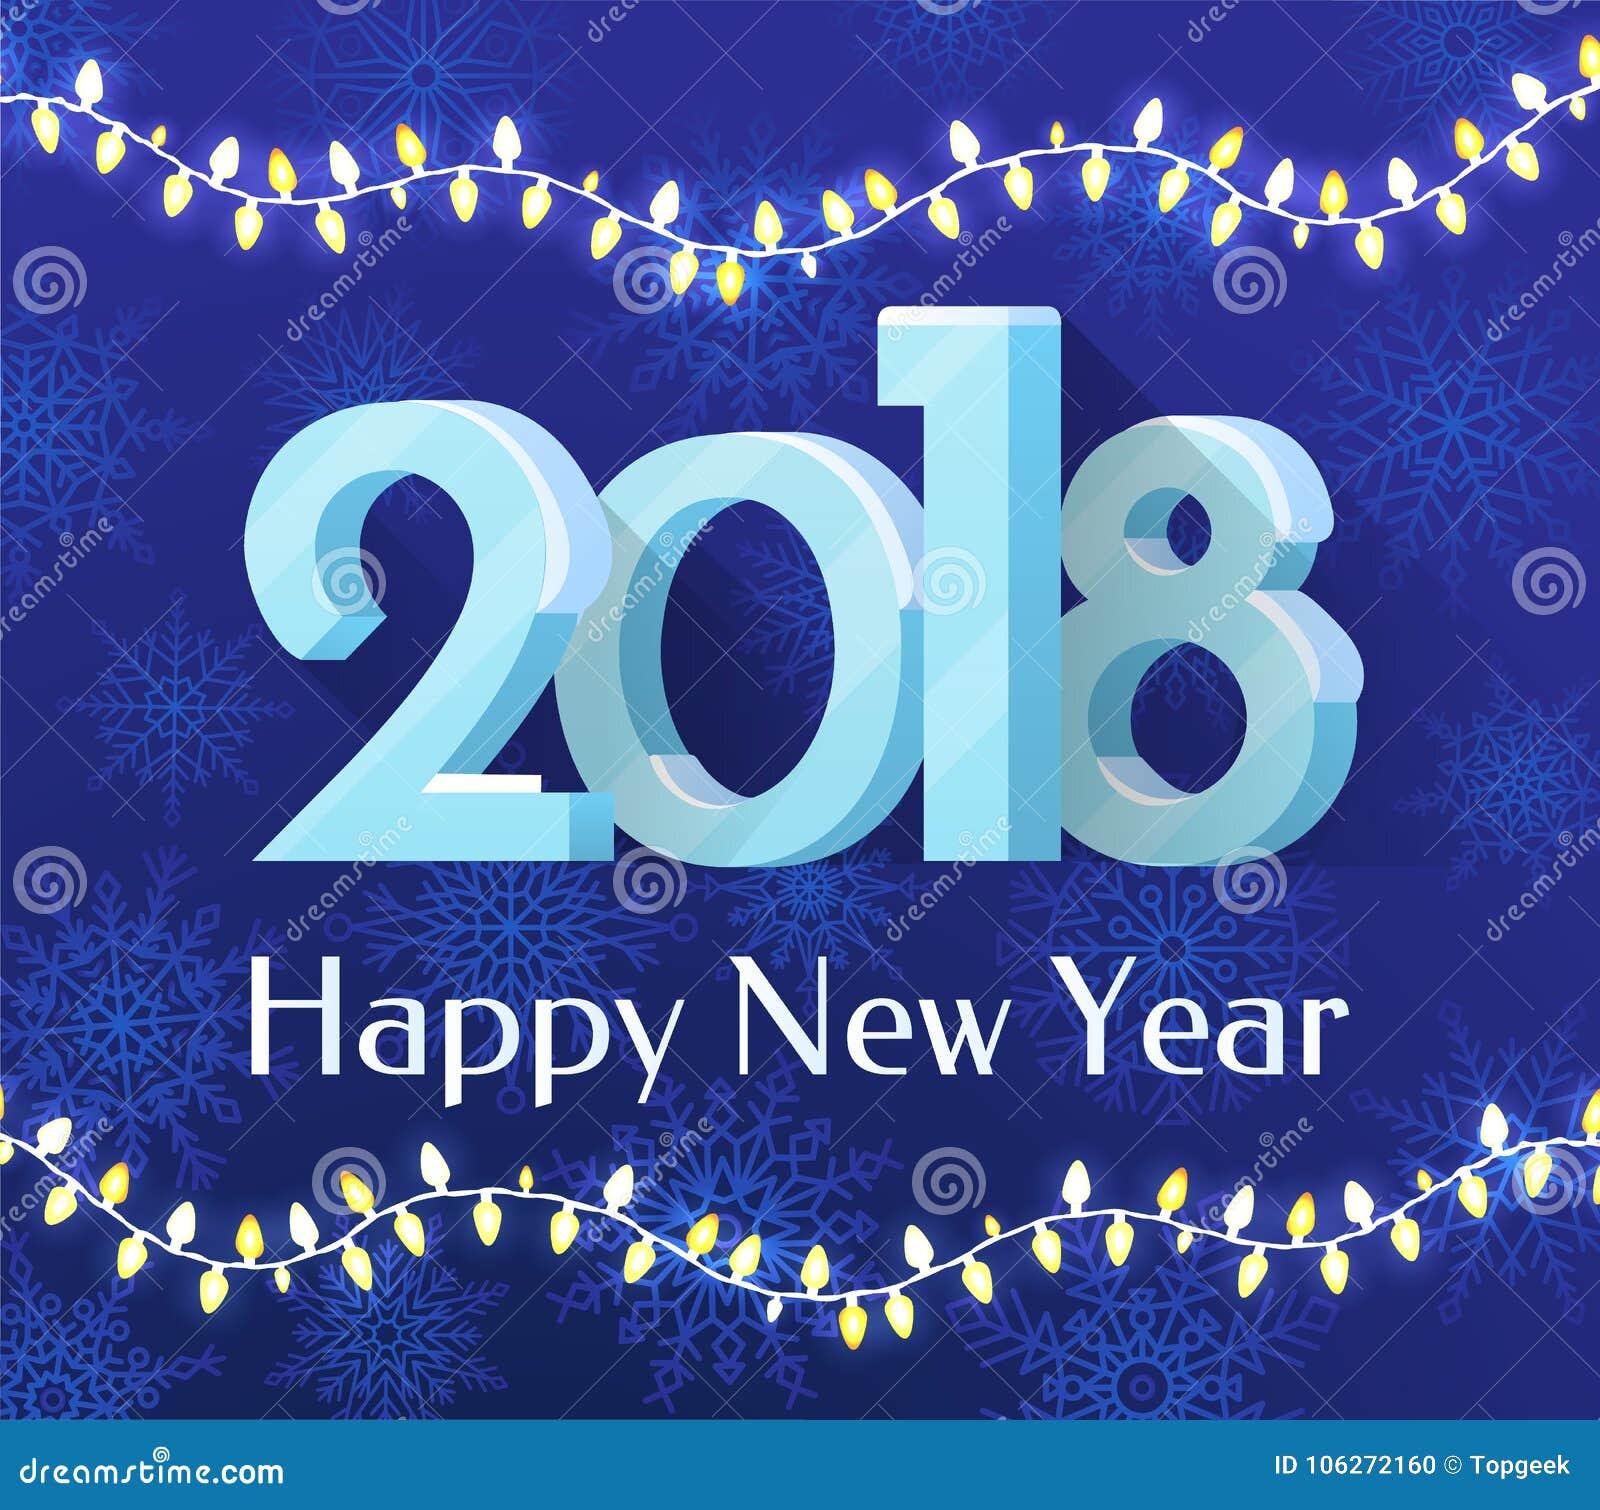 happy new year 2018 banner vector illustration